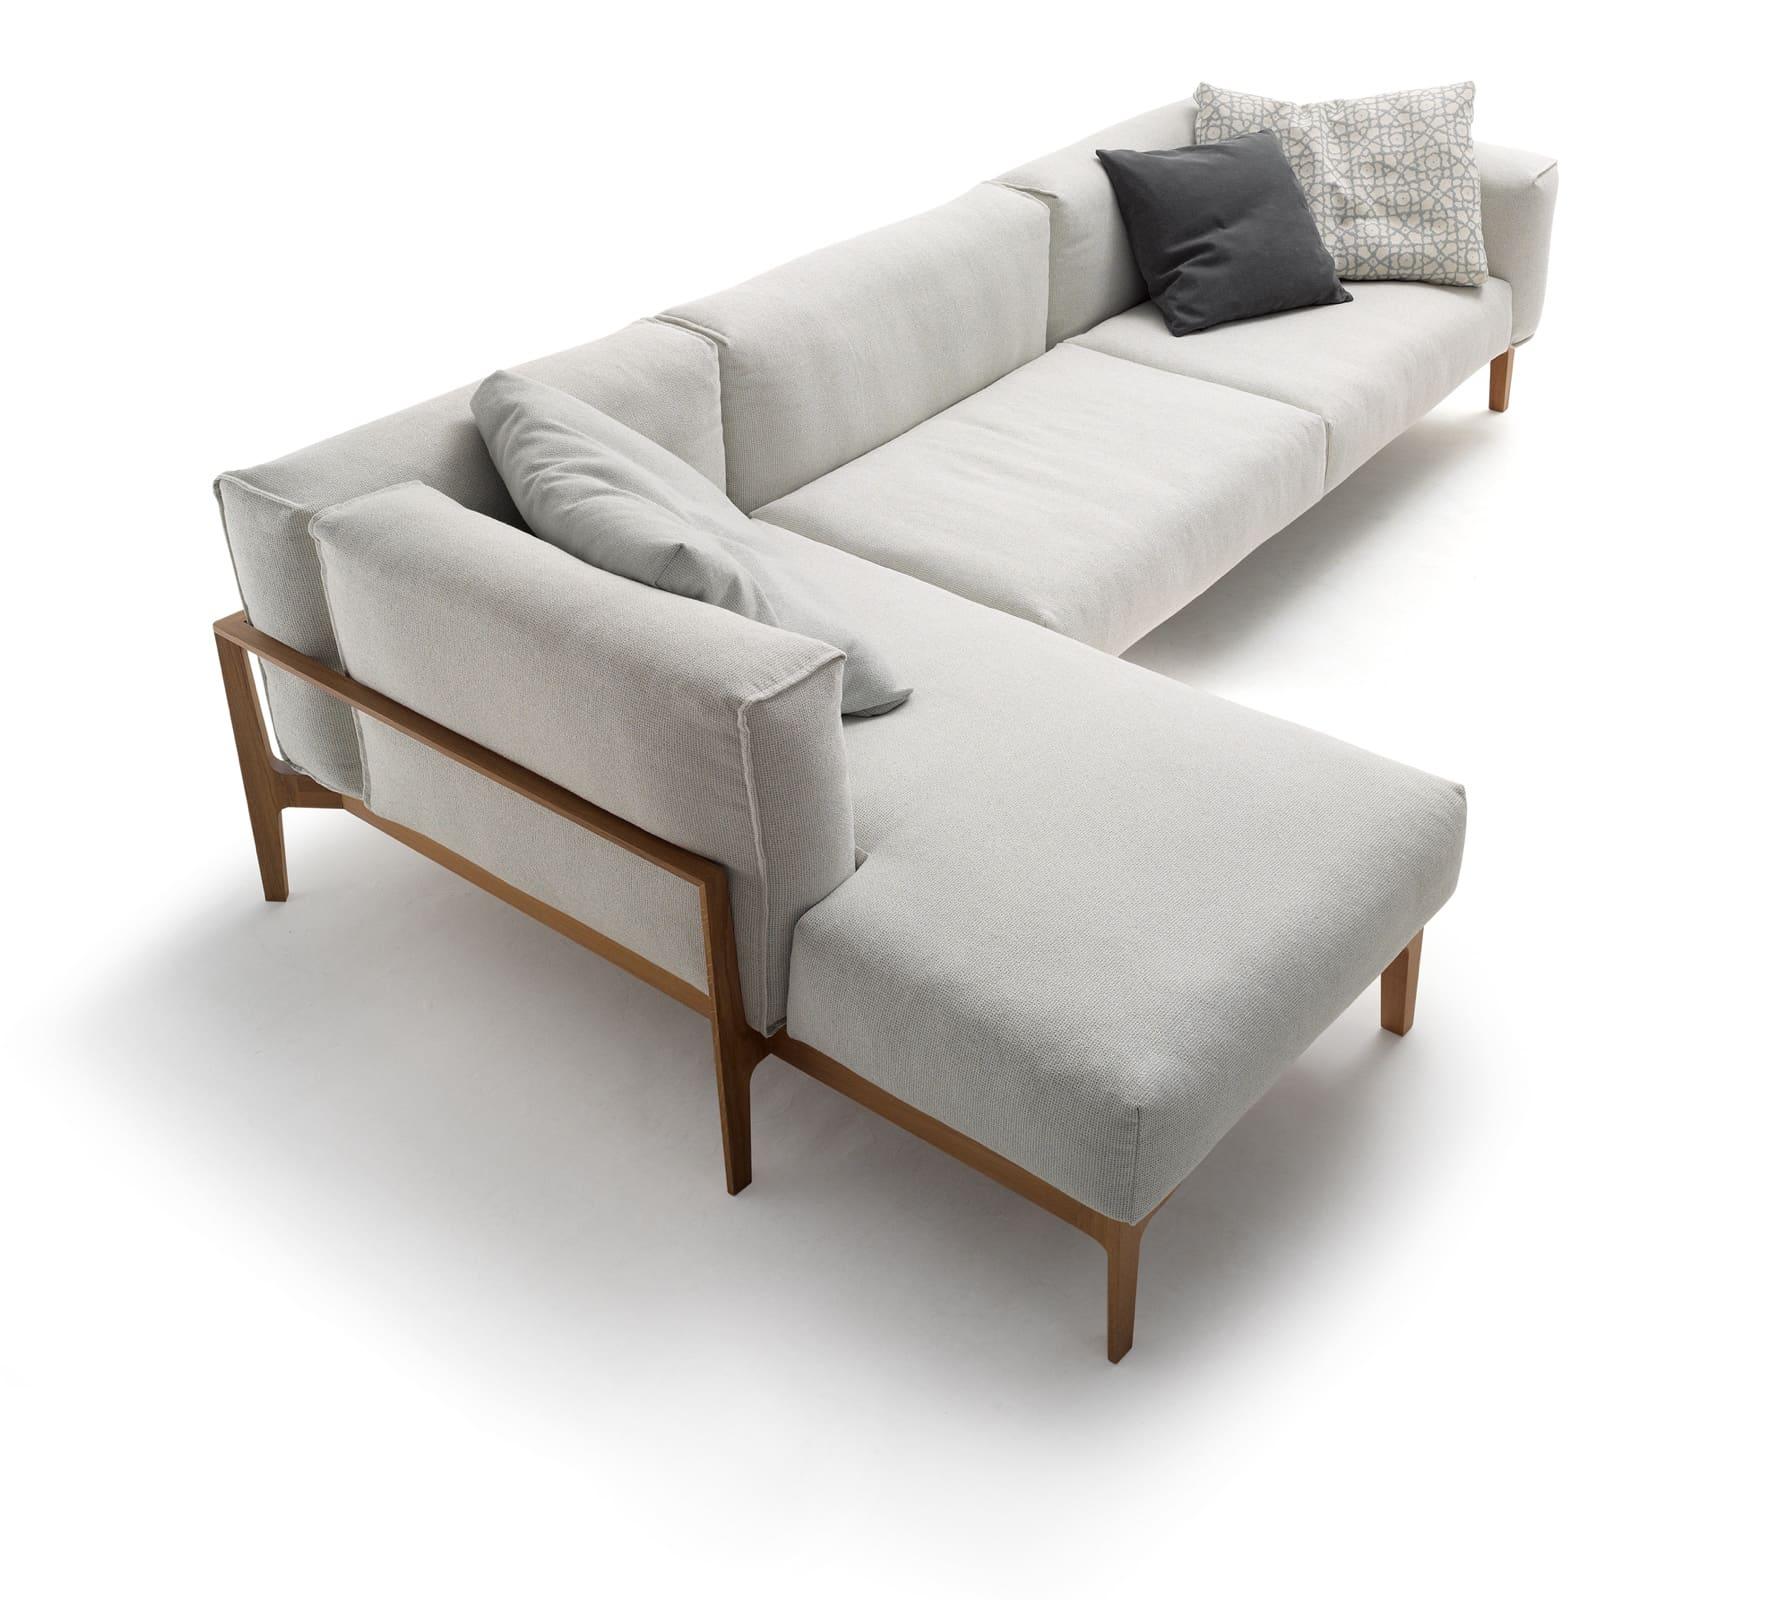 elm sofa professional cor. Black Bedroom Furniture Sets. Home Design Ideas